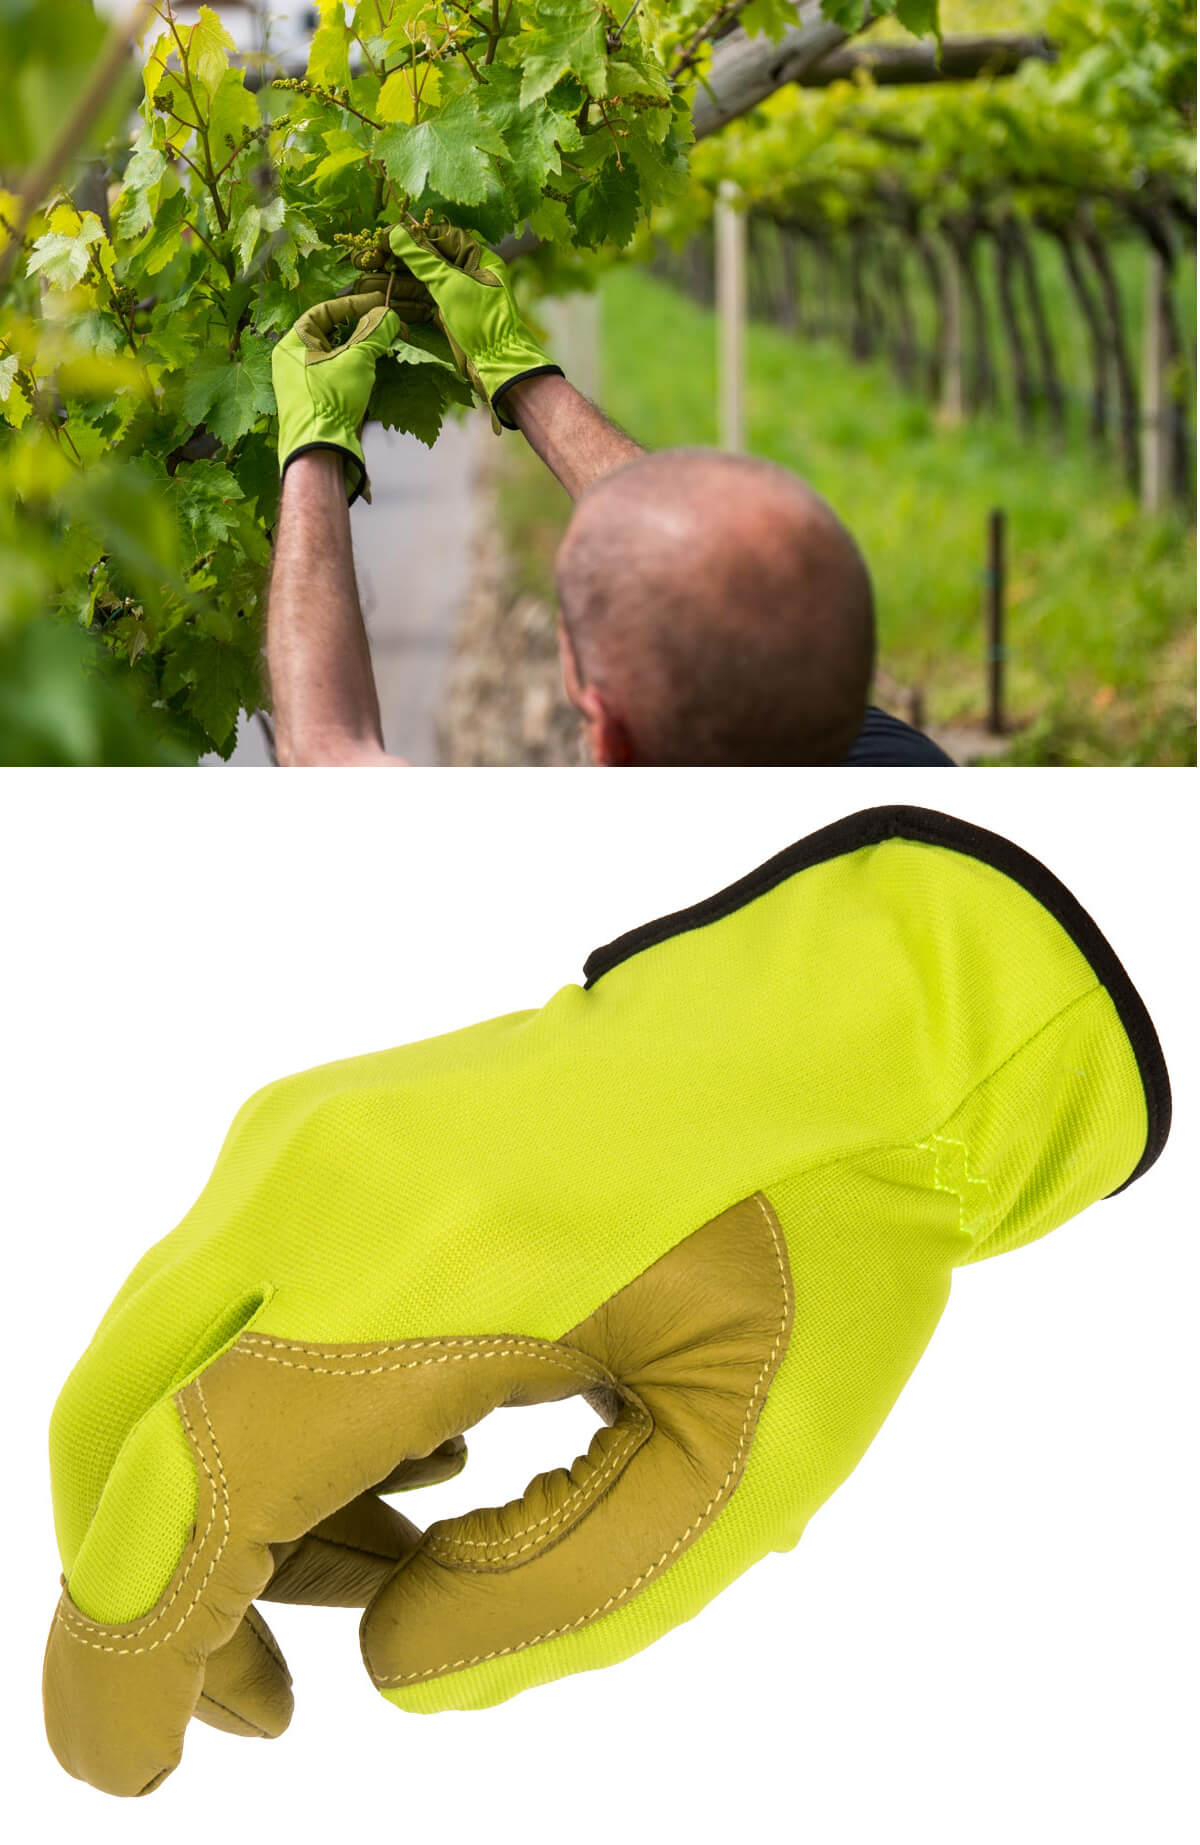 guanti-da-giardino-in-pelle-stocker-21032